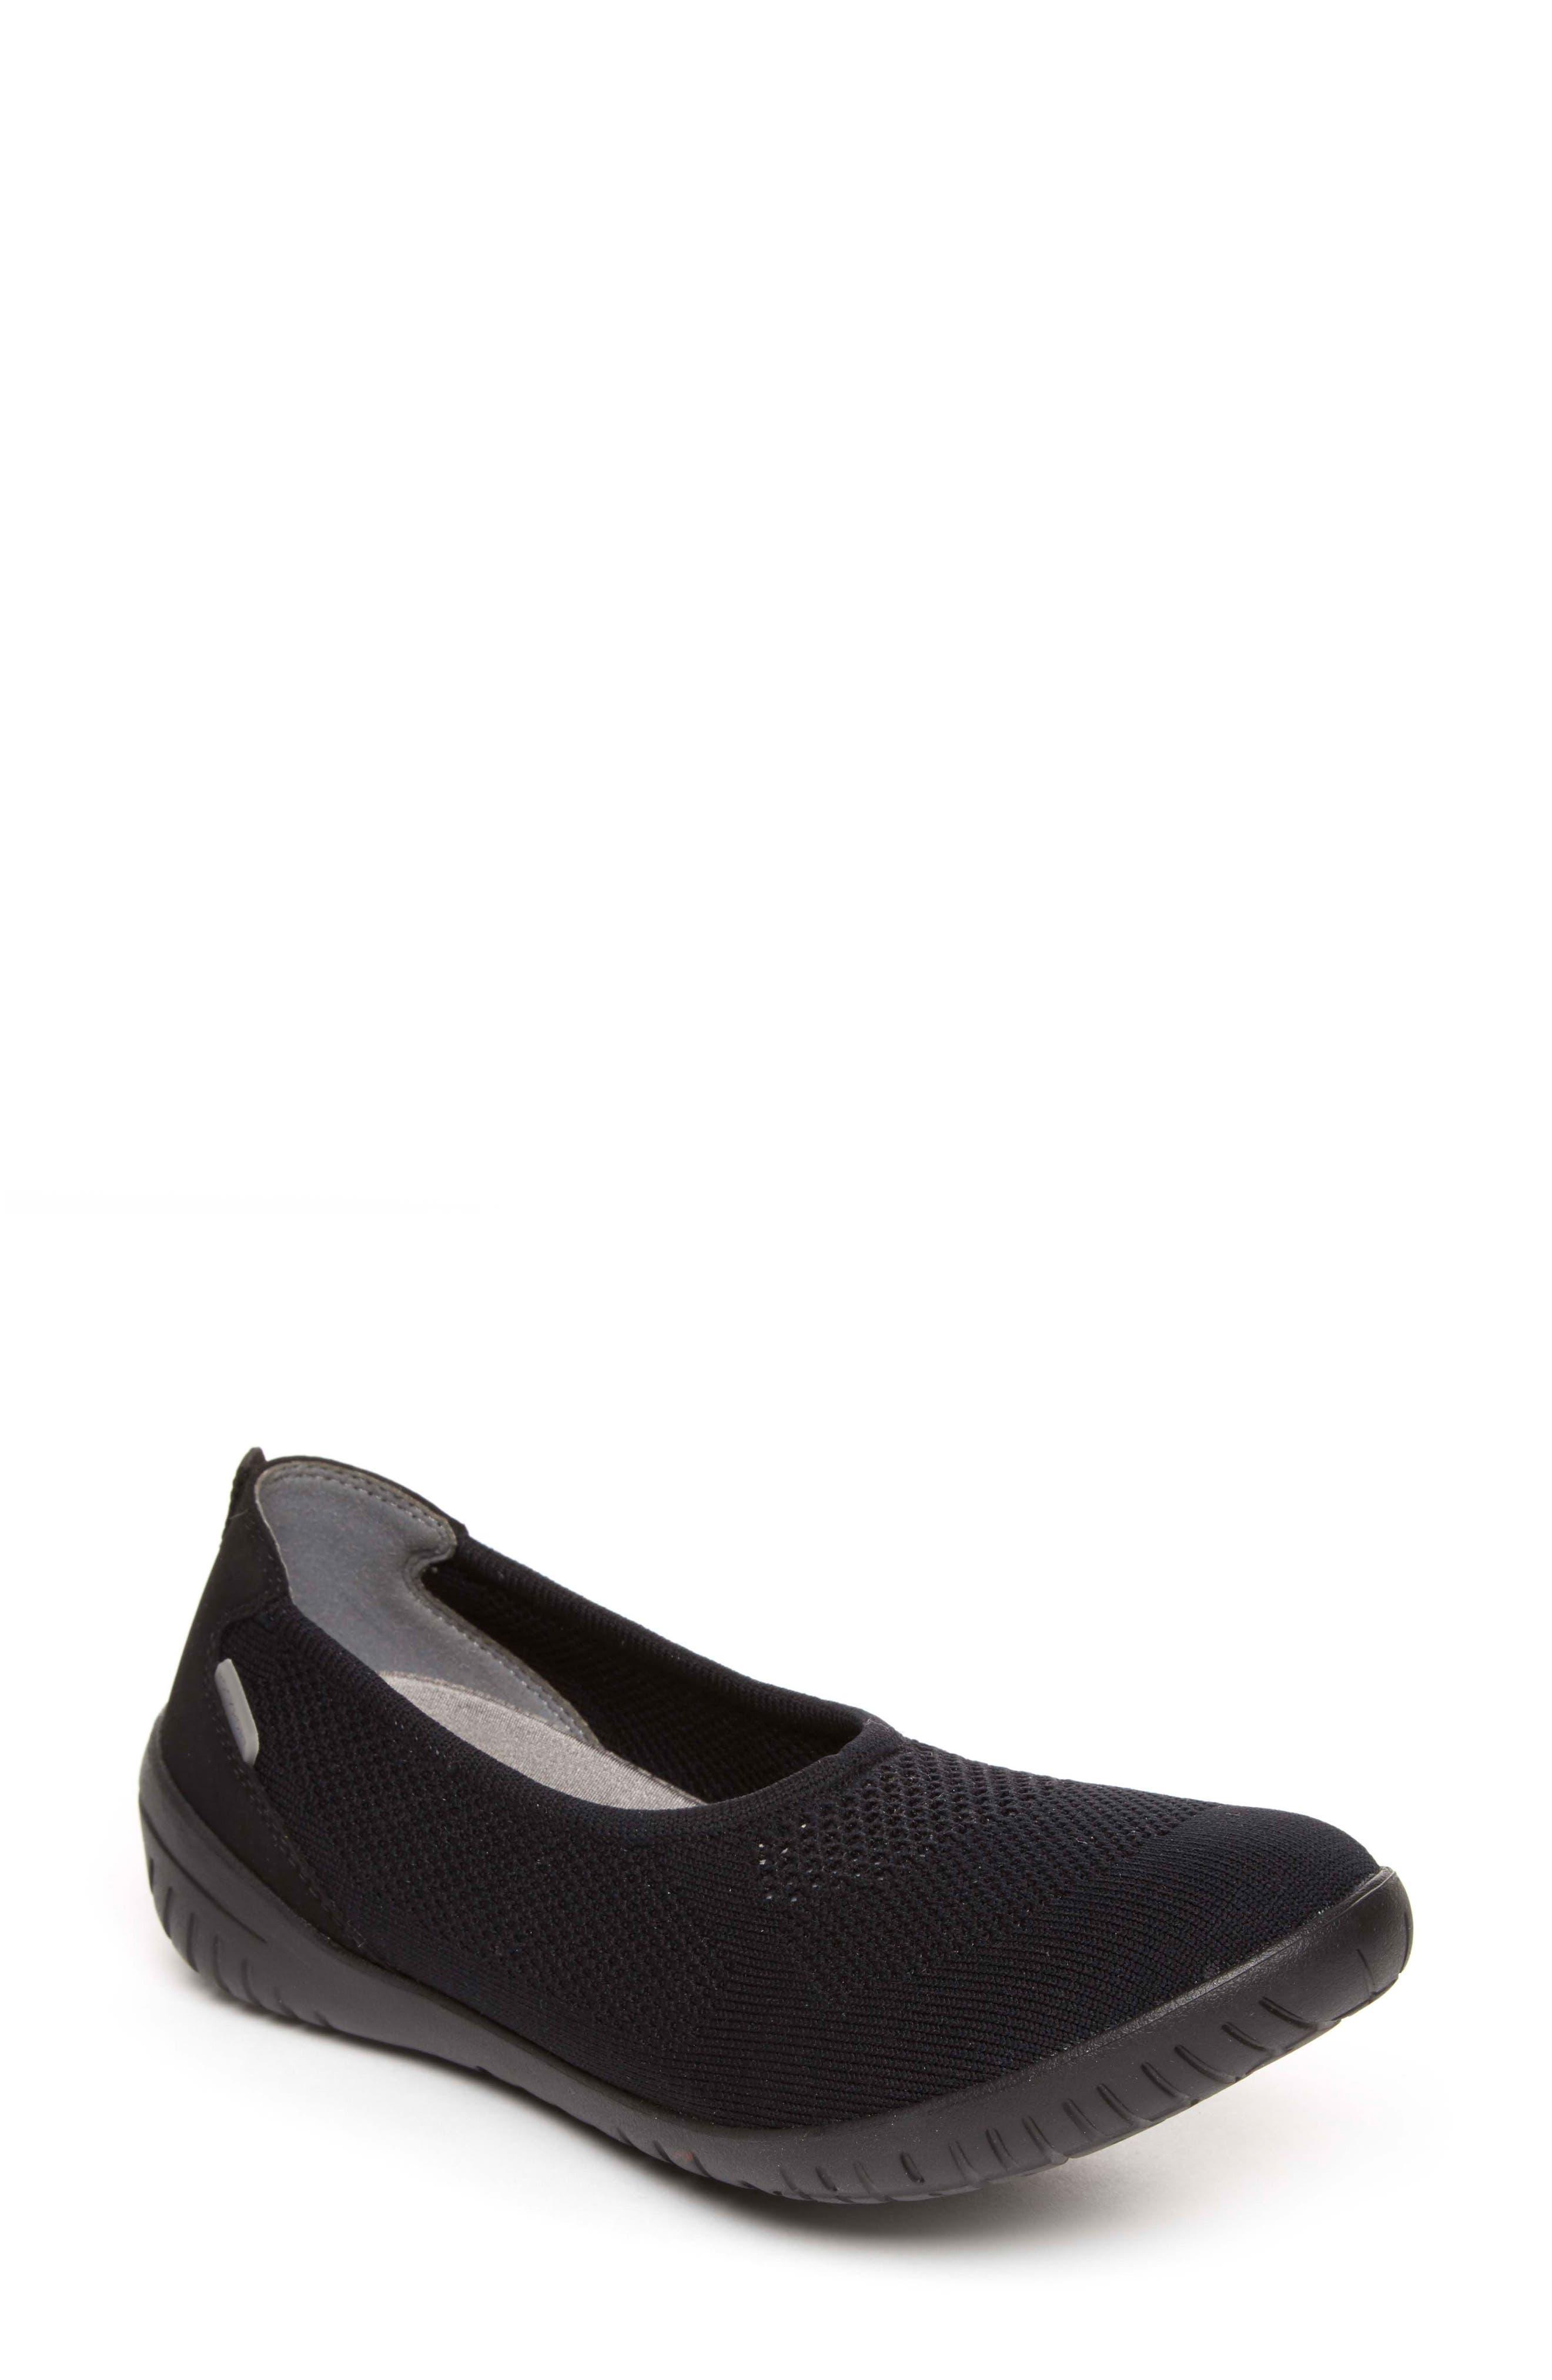 Raelyn Knit Ballet Sneaker,                             Main thumbnail 1, color,                             BLACK FABRIC